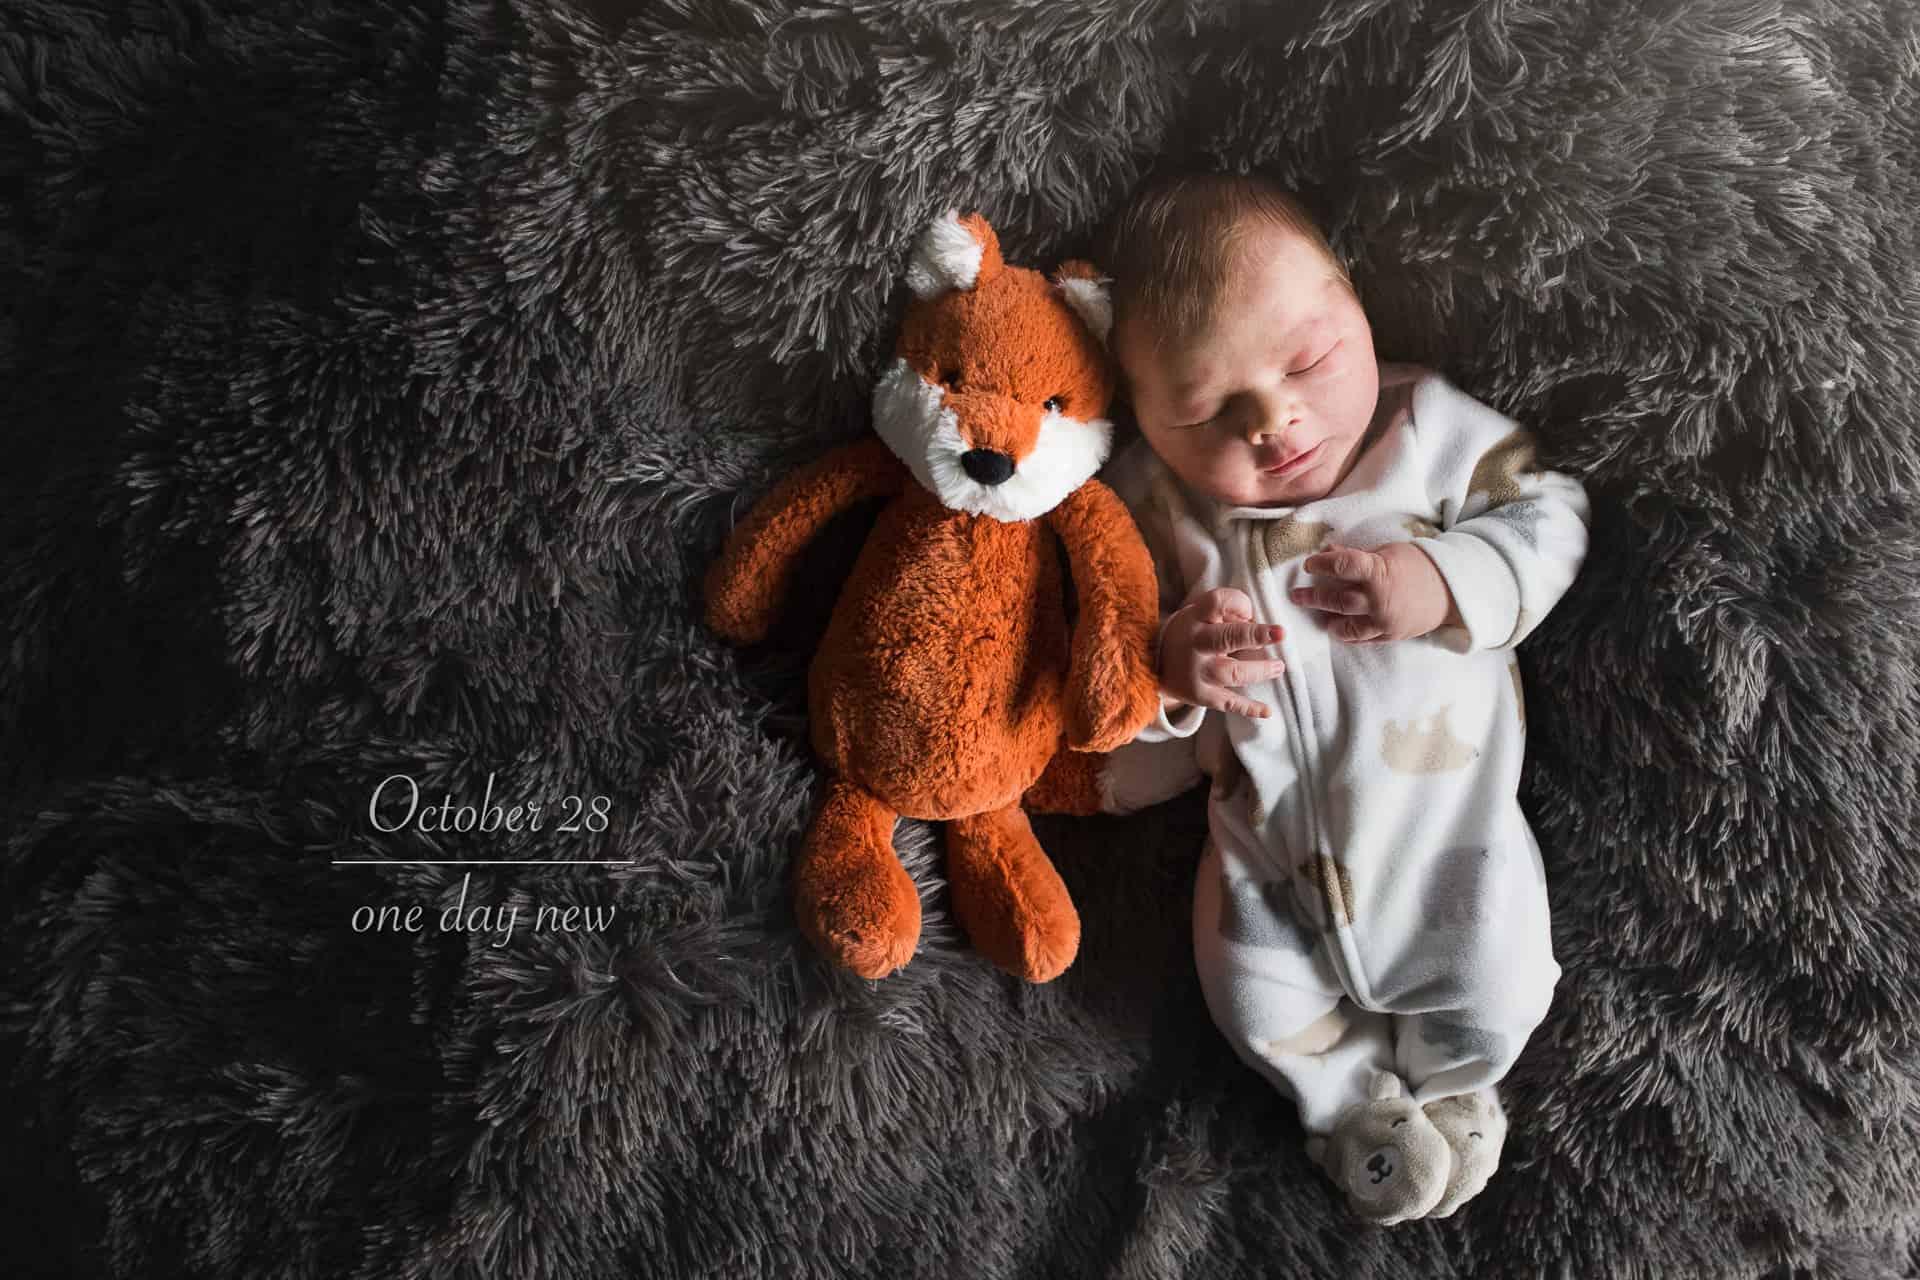 newborn baby in a sleeper beside a stuffed box on a grey blanket